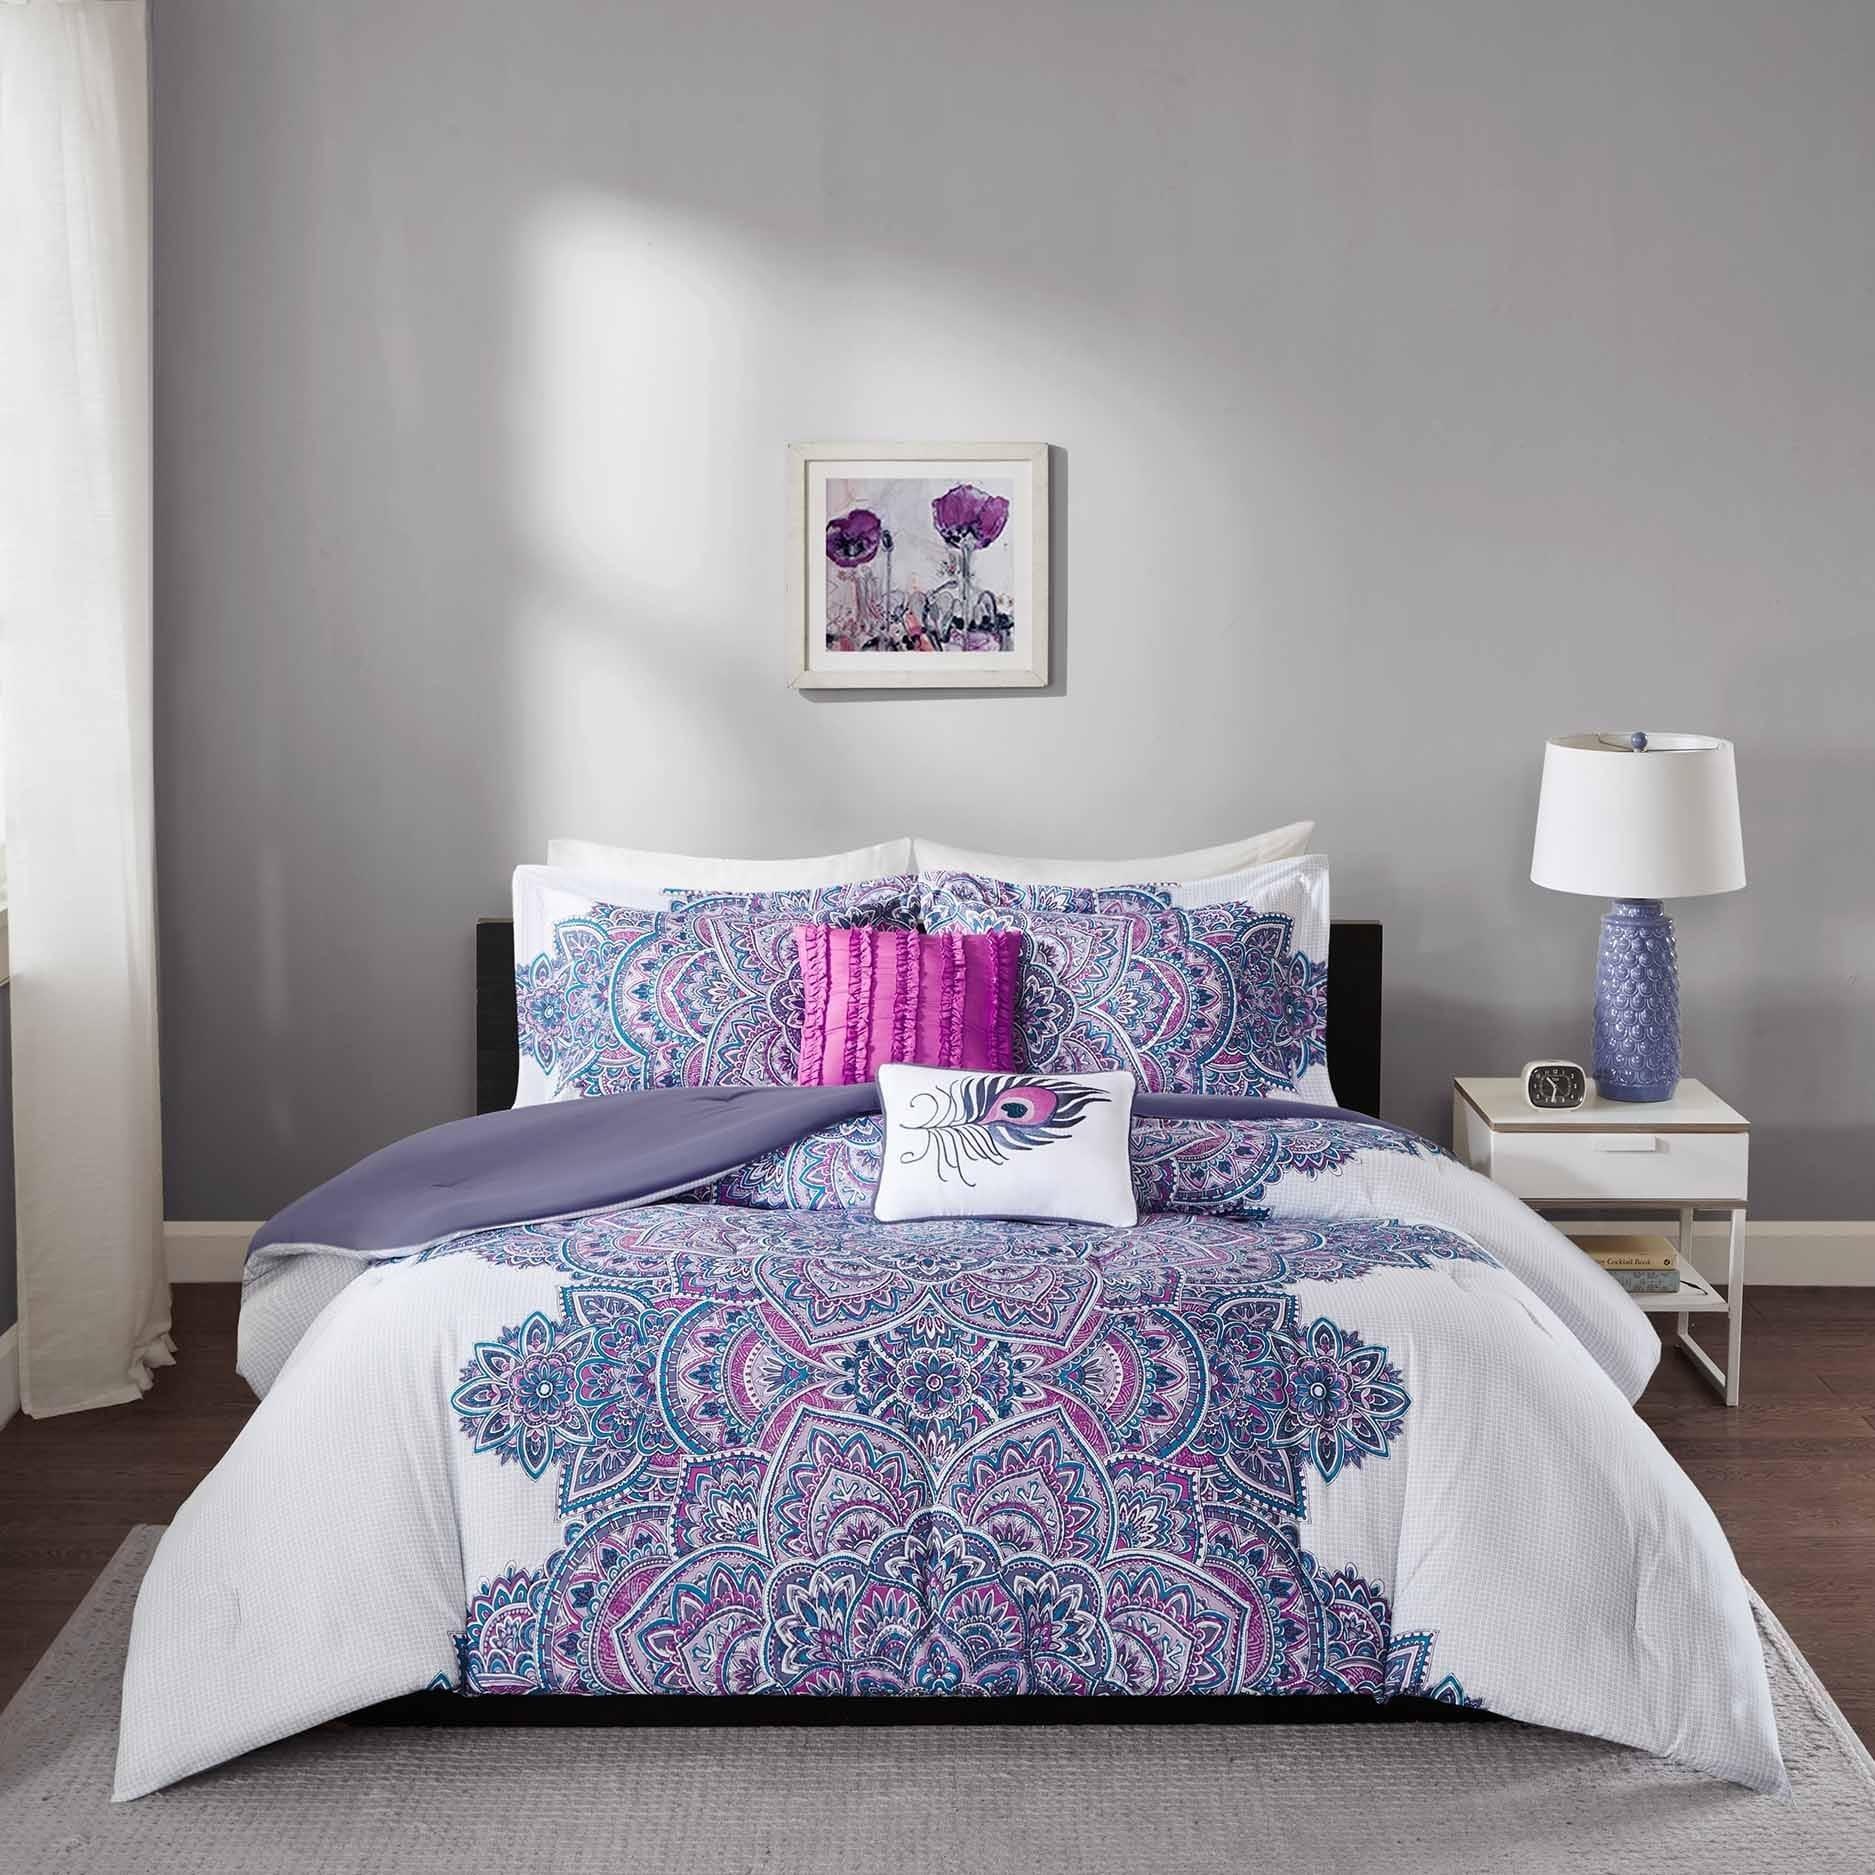 Shop Intelligent Design Katarina Purple Comforter Set Overstock 12136501,Beautiful Simple Easy Rangoli Designs For Diwali